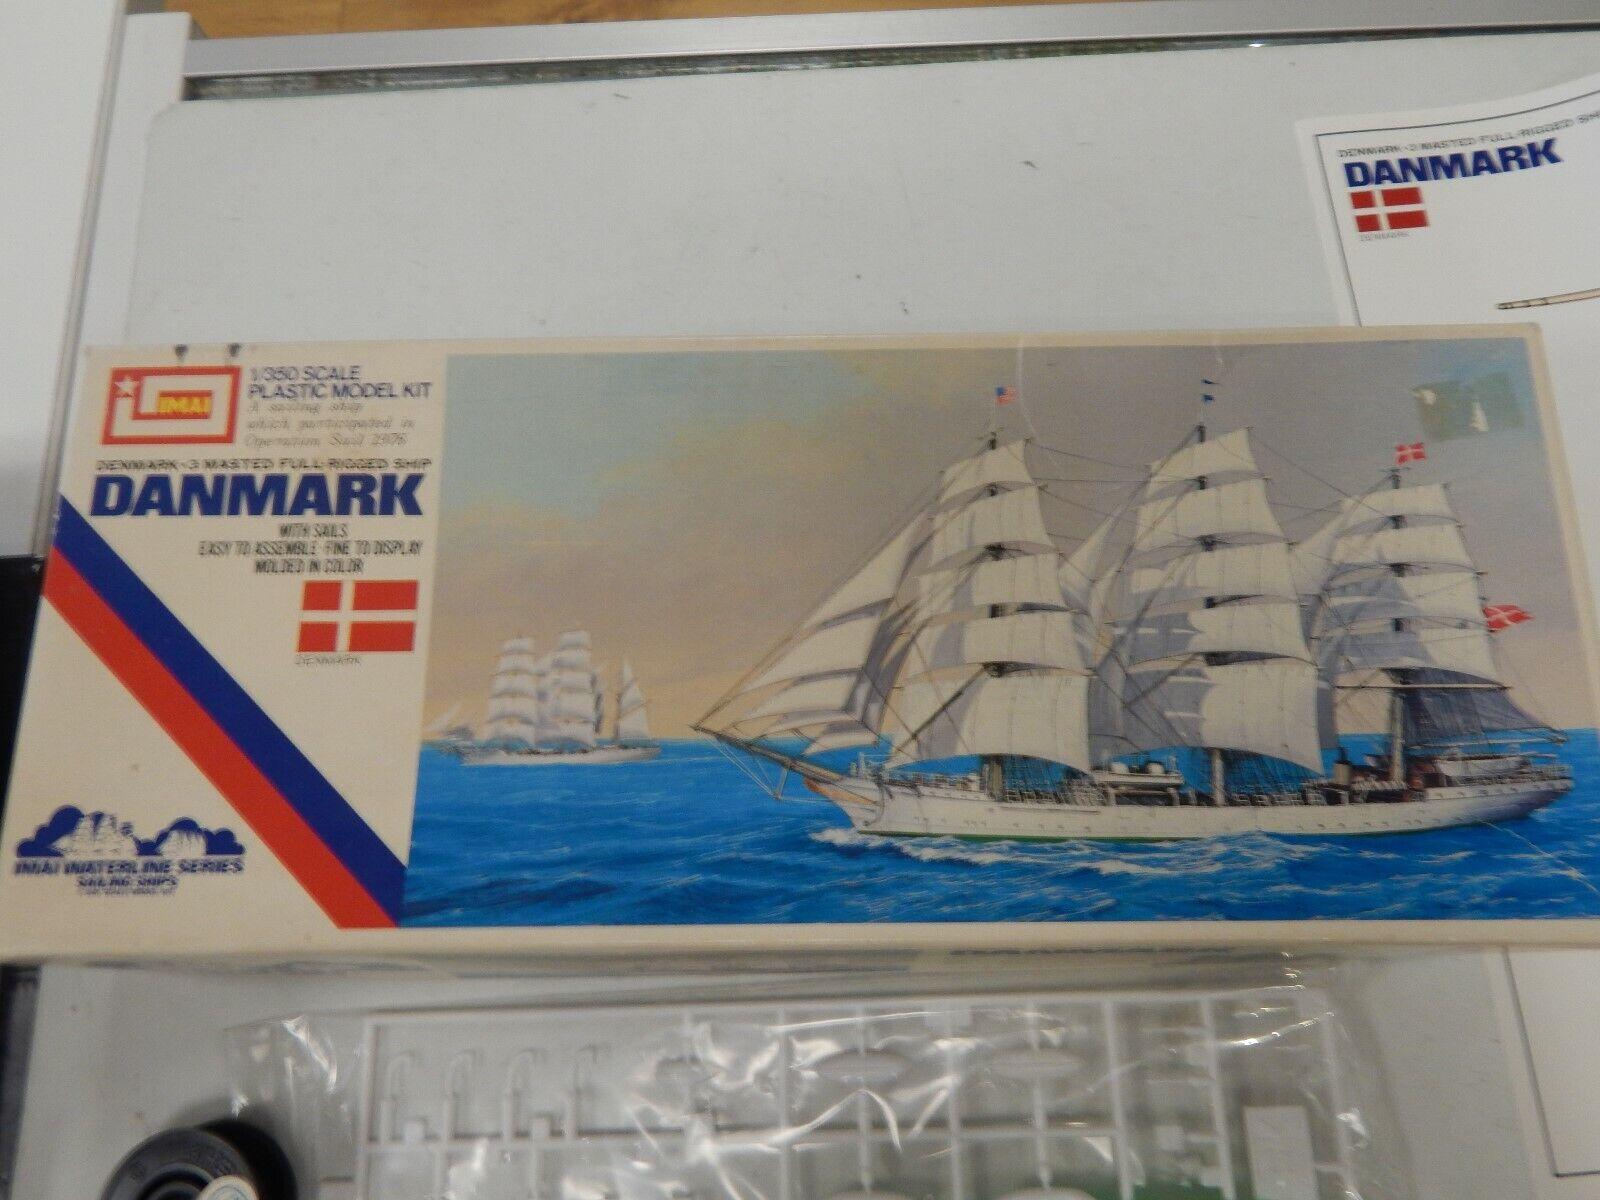 1 350 scale kit Danmark by Imai